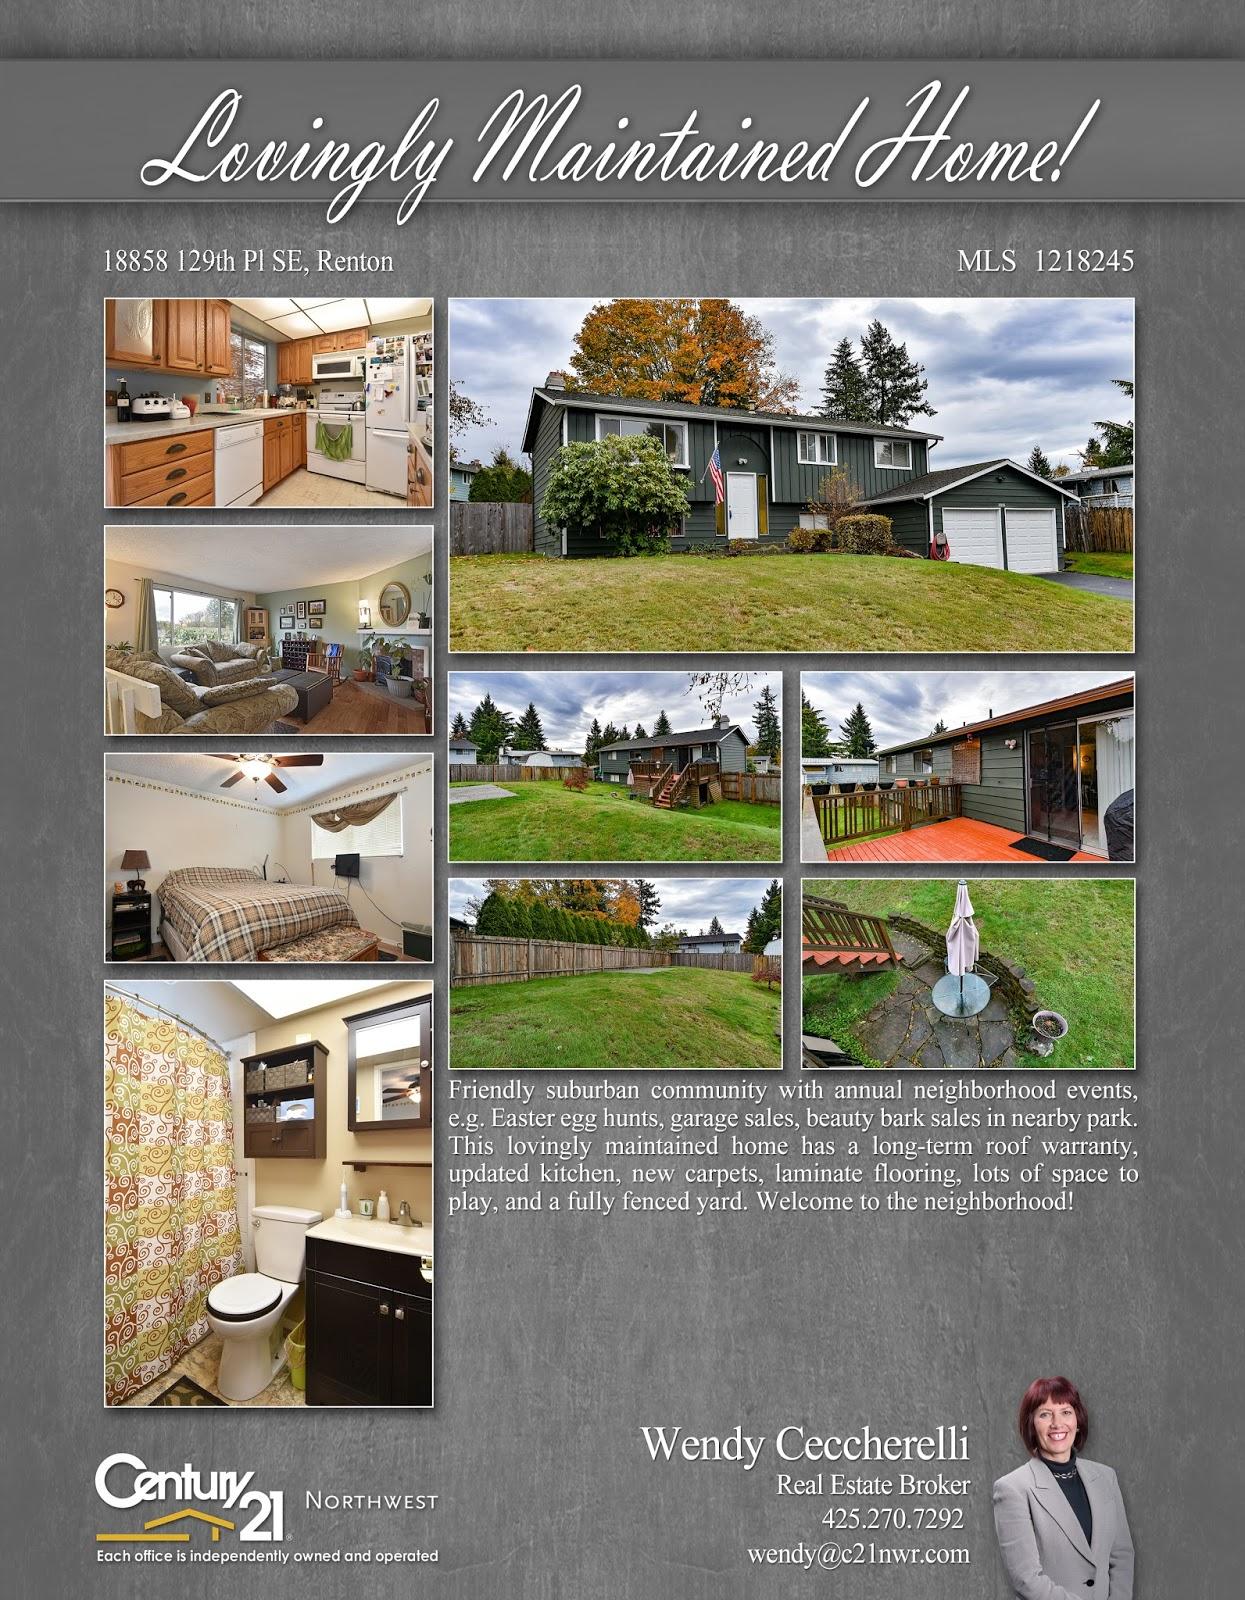 Seattle Real Estate Investor: Renton Open House Sunday